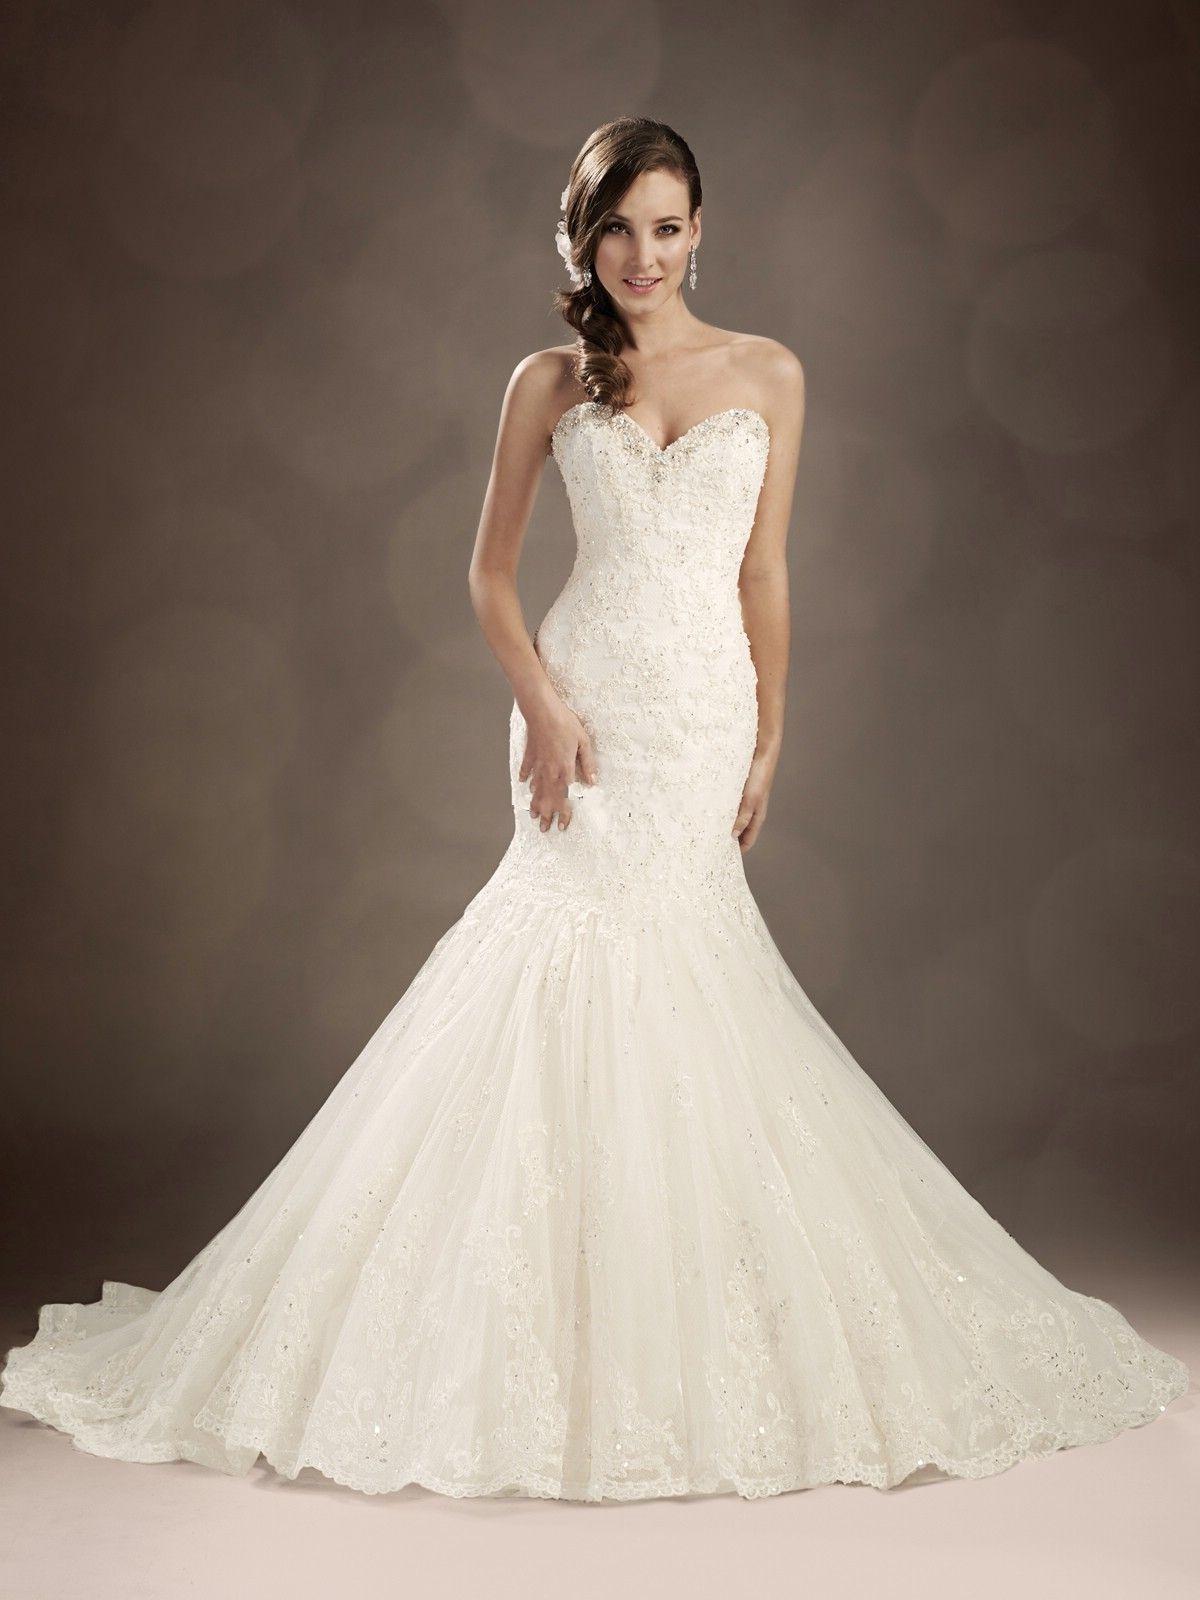 30 Vintage Wedding Dresses Bride Style | Pinterest | Mermaid wedding ...